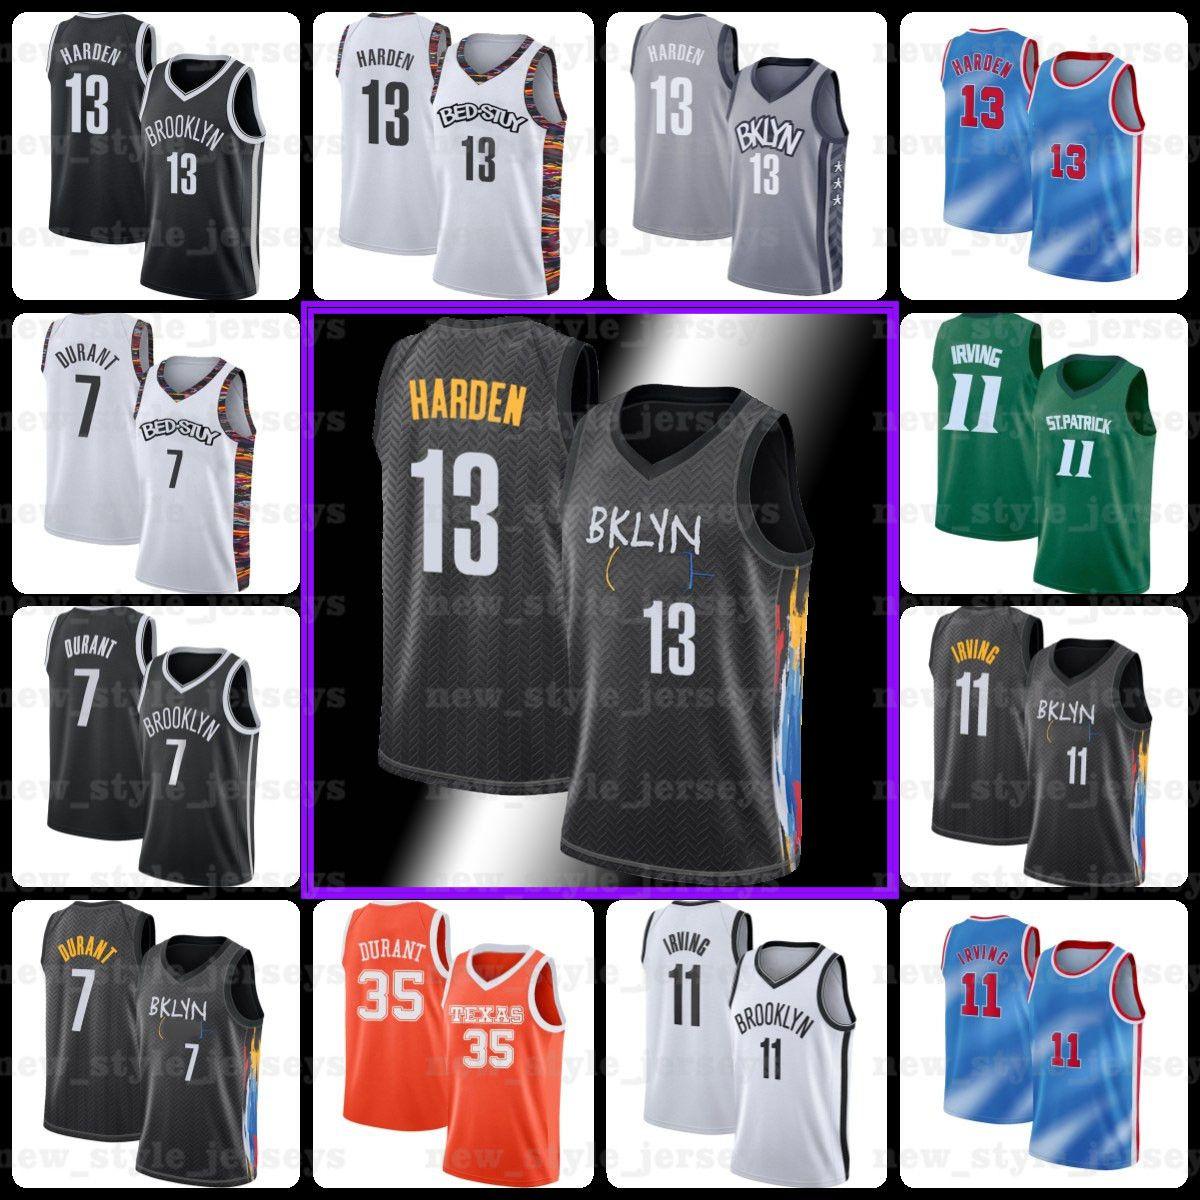 13 Harden 7 كيفن 11 Kyrie Durant Irving BlackبروكلينNets Jersey Biggie Dinwiddie كلية سبنسر كرة السلة جيرسي Z2